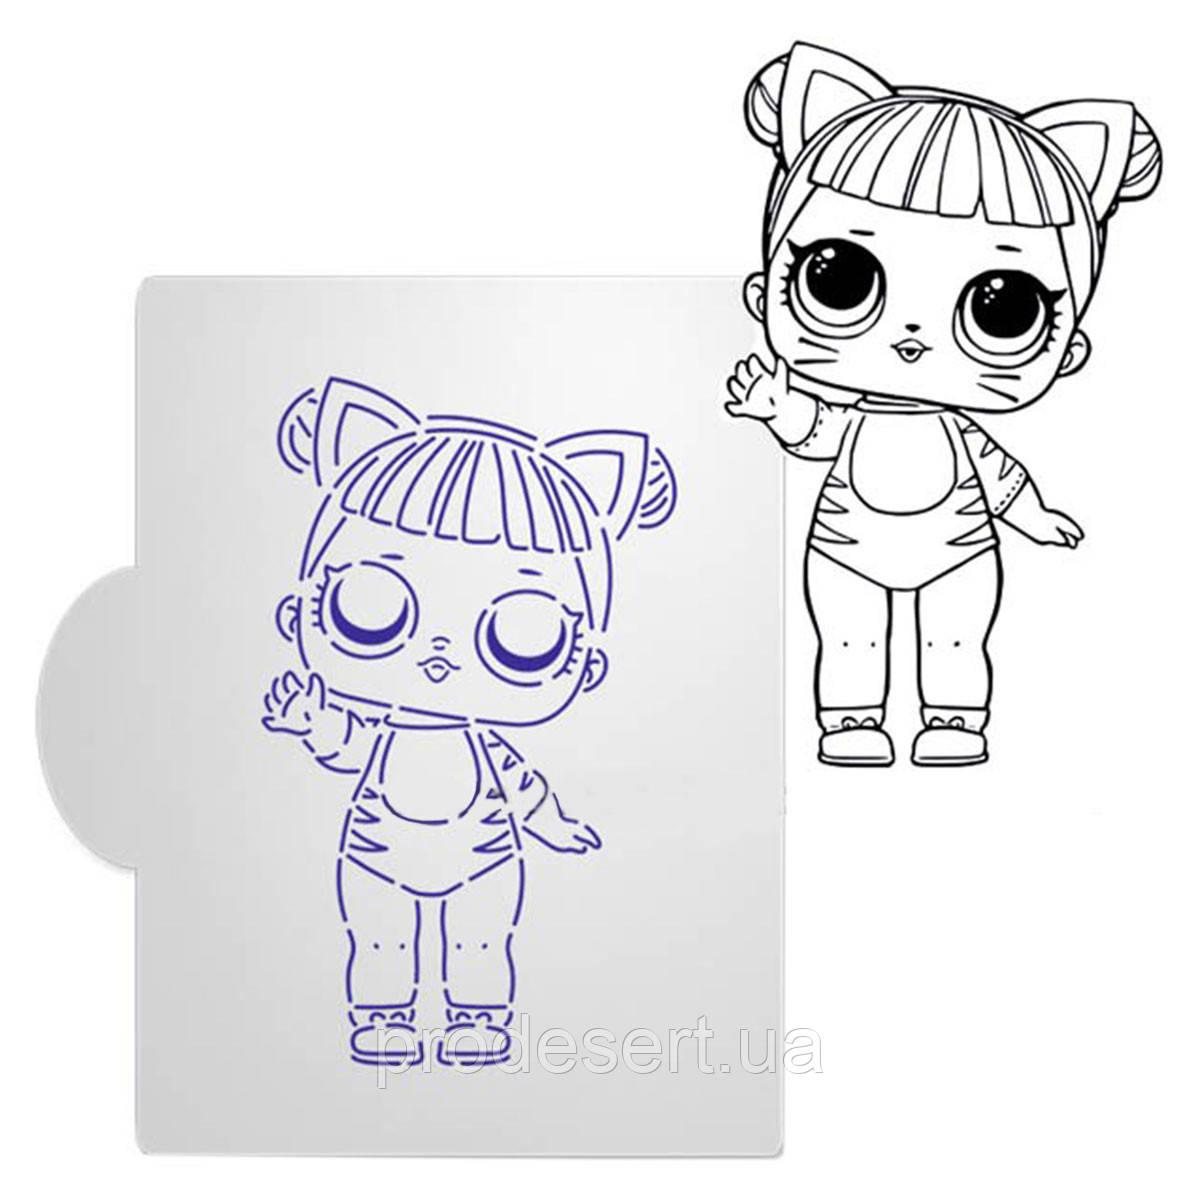 Кукла ЛОЛ-1 трафарет для пряников 11*7 см (TR-2)